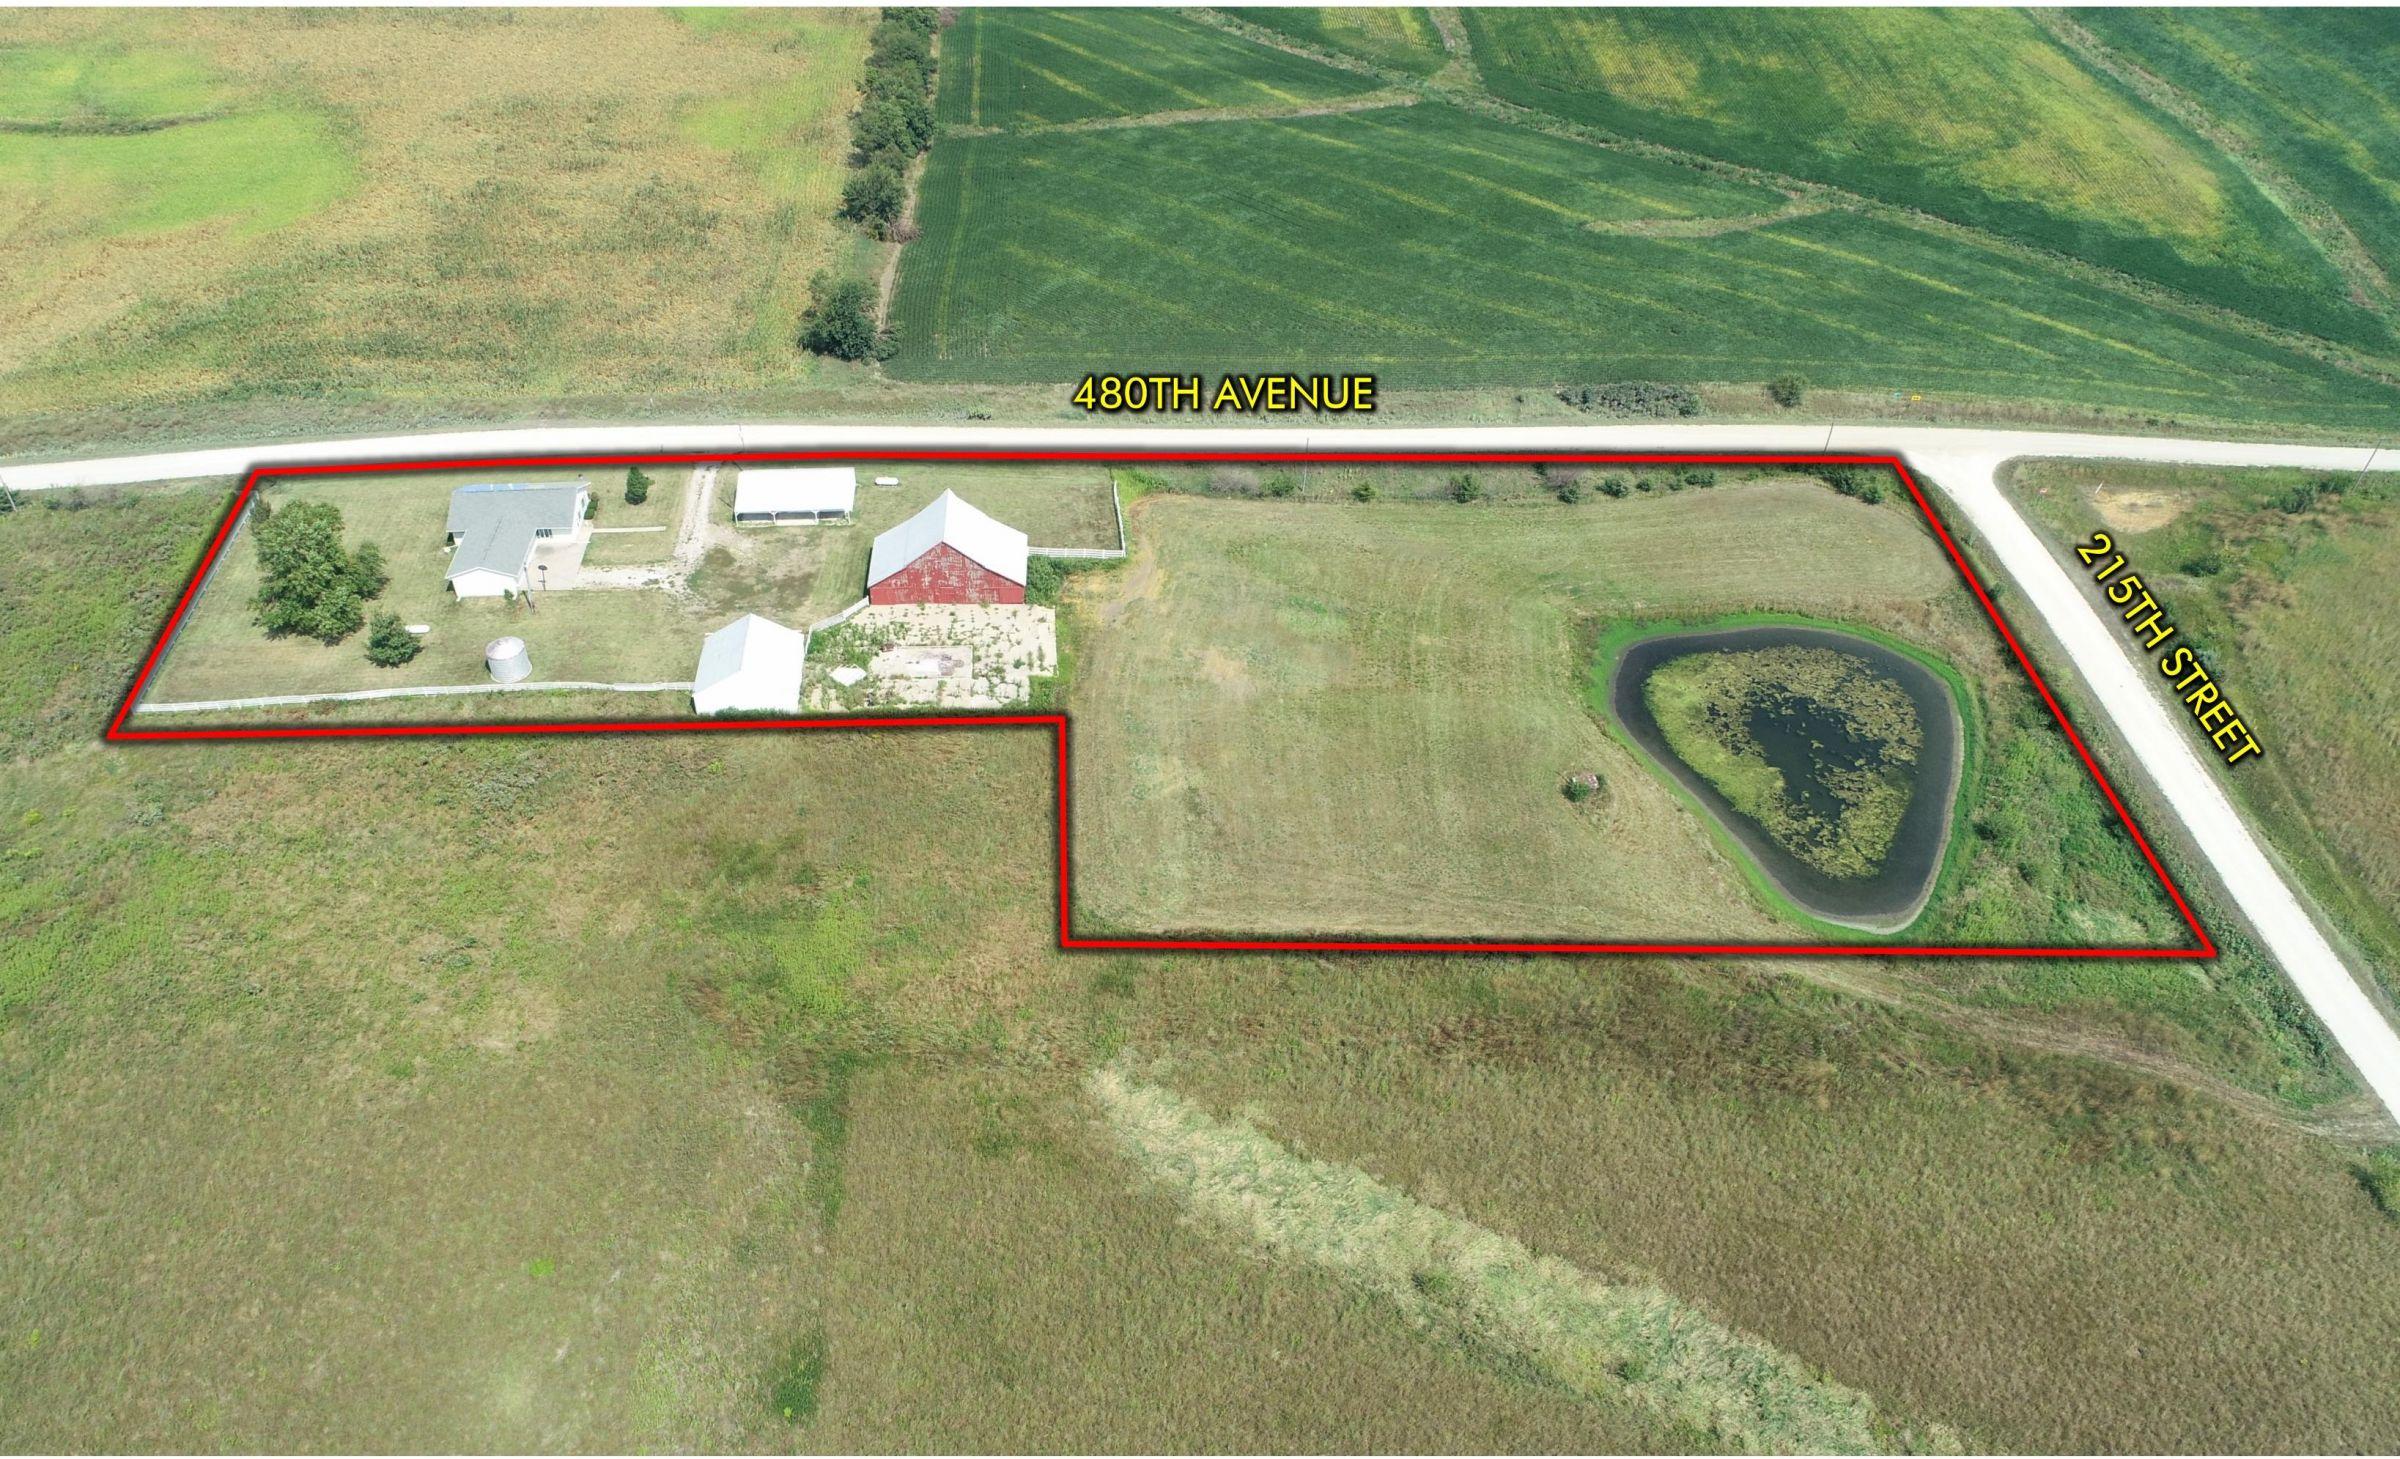 residential-land-poweshiek-county-iowa-5-acres-listing-number-15149-2-2020-08-28-195805.jpg